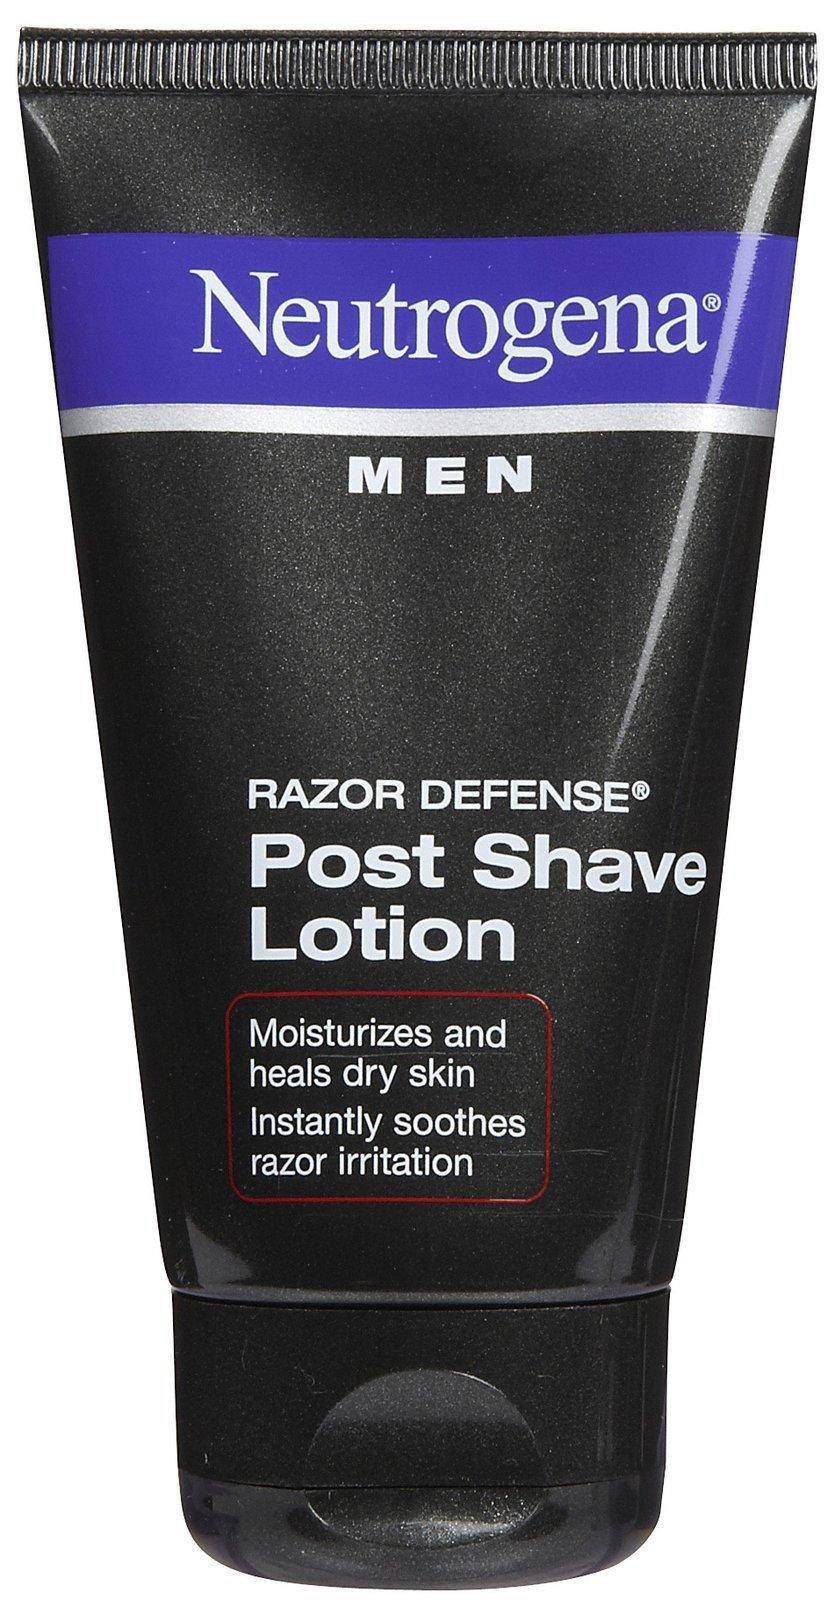 Neutrogena Men Razor Defense Post Shave Lotion - 2.5 oz